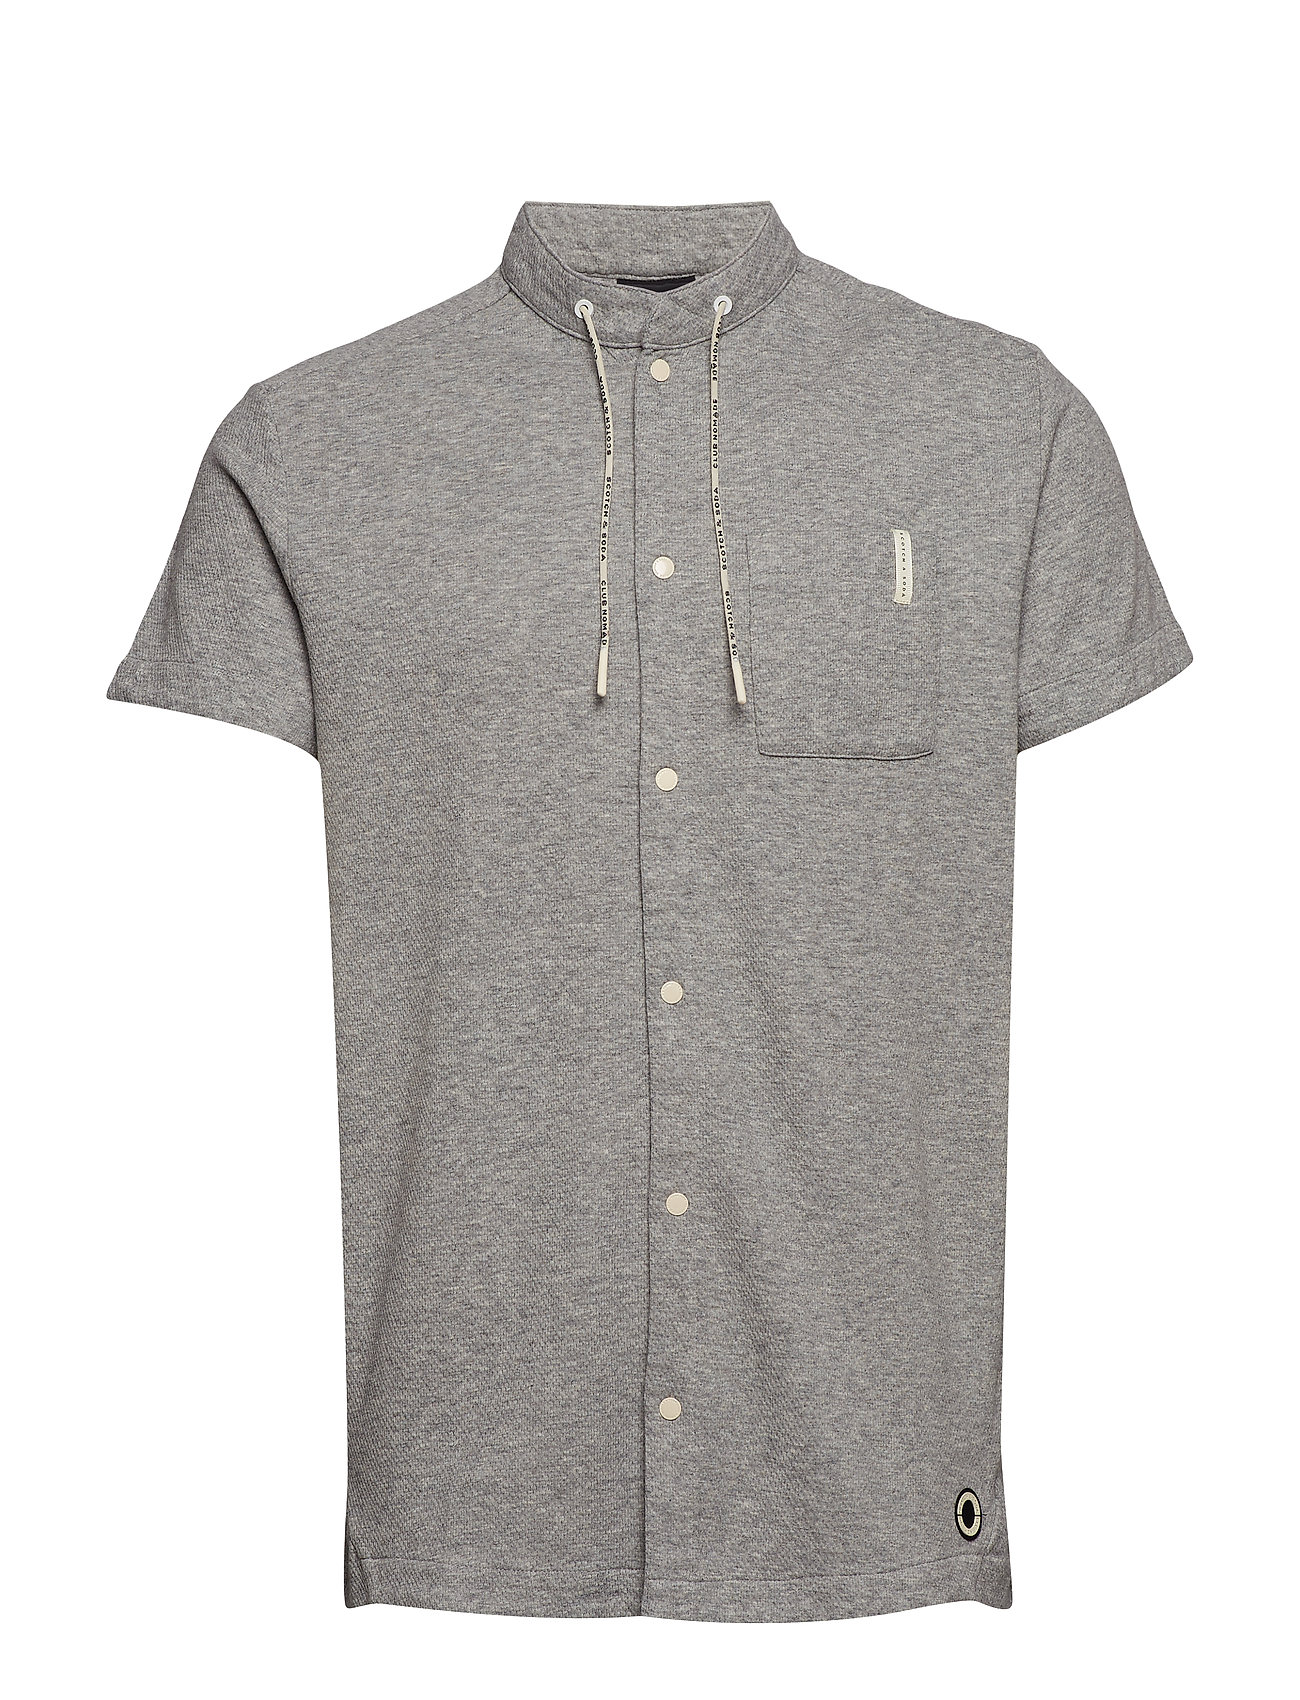 Scotch & Soda Club Nomade S/S shirt with technical details - GREY MELANGE